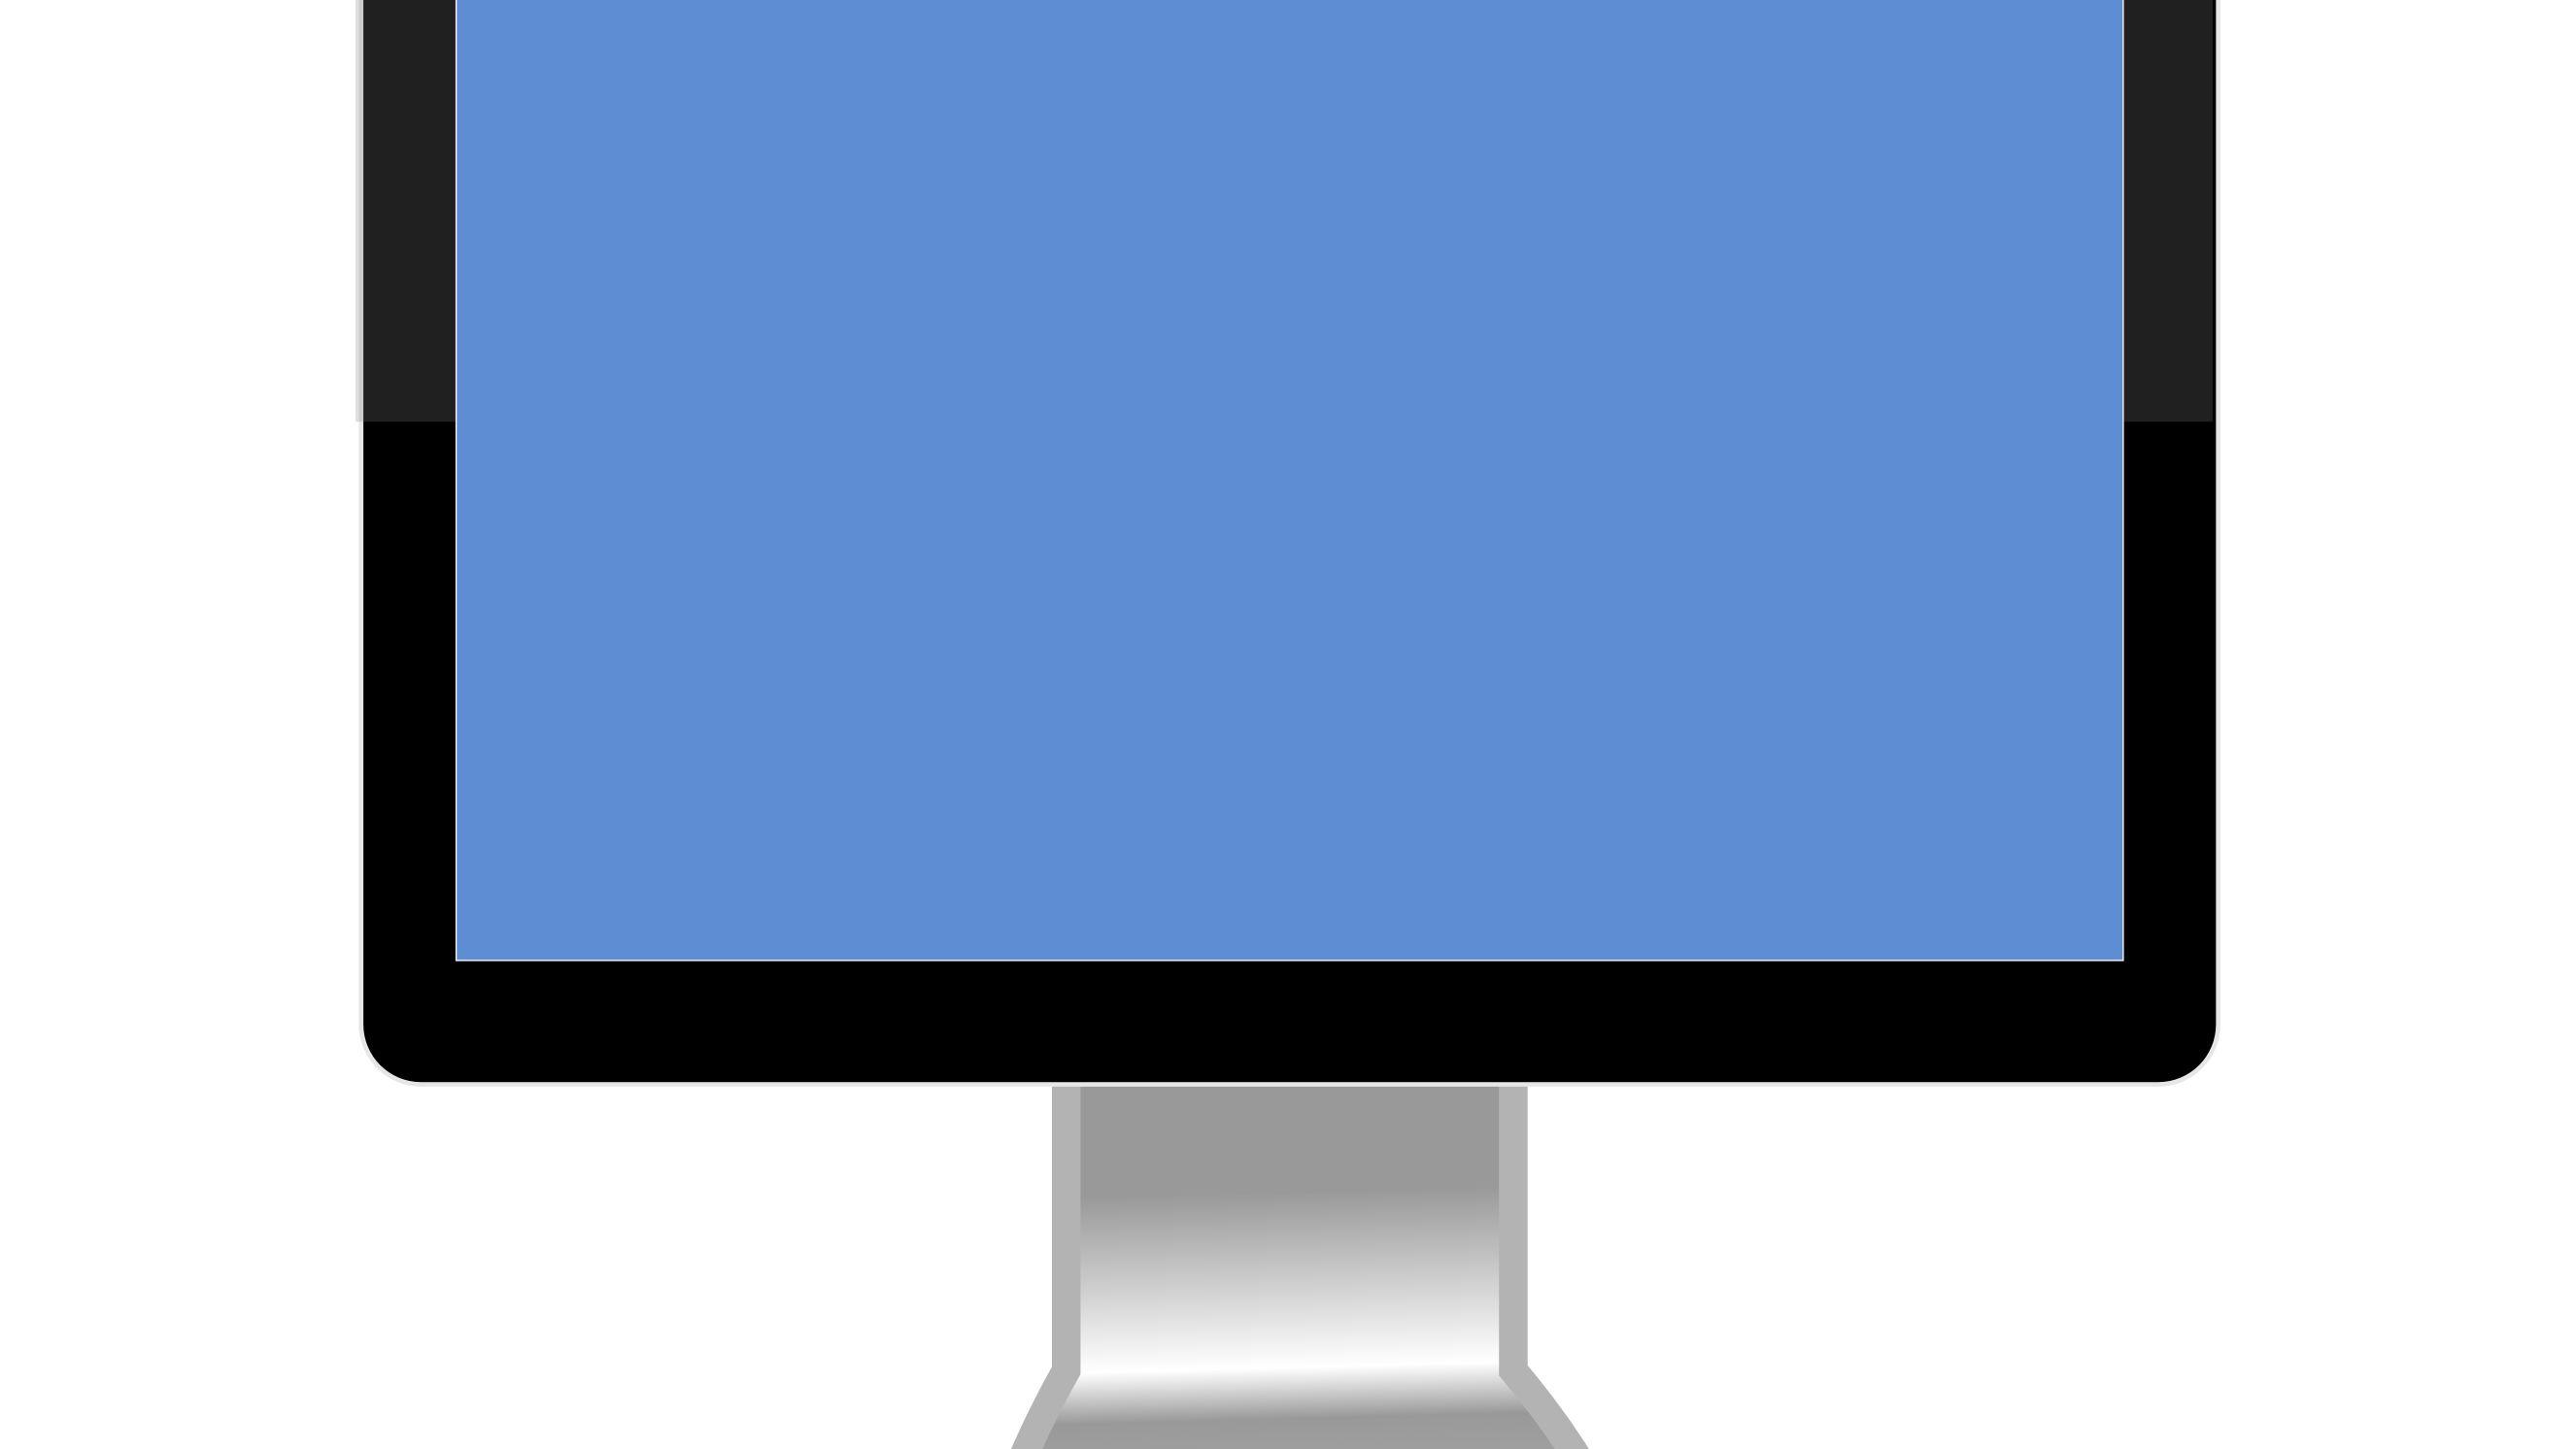 Fortnite Stuck On Loading Screen Mac mac problems: stuck at the blue or black screen